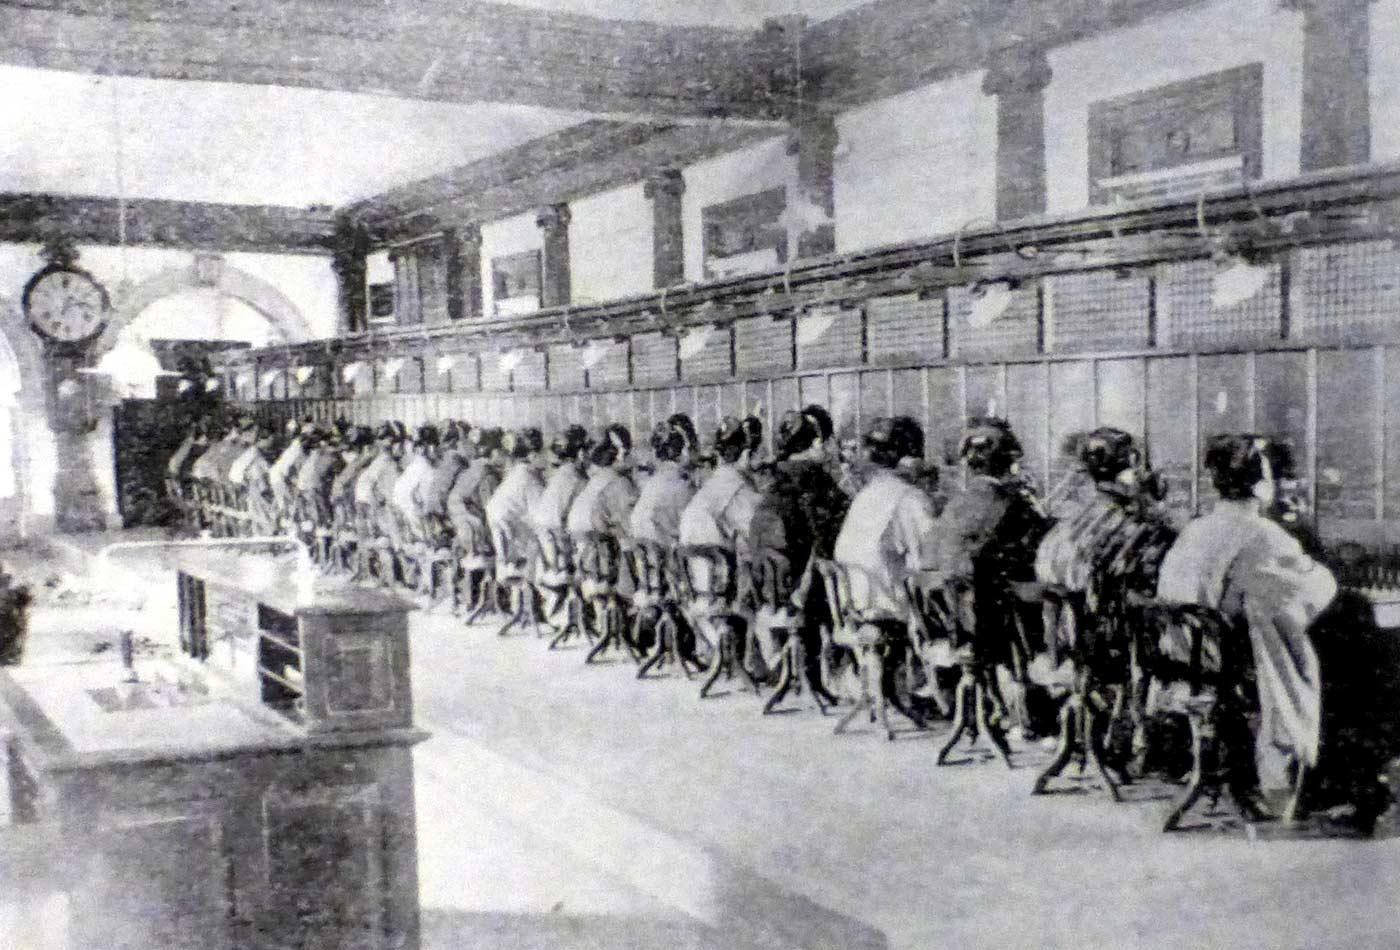 Telephone exchange operators in Yaesu, Japan, 1902.